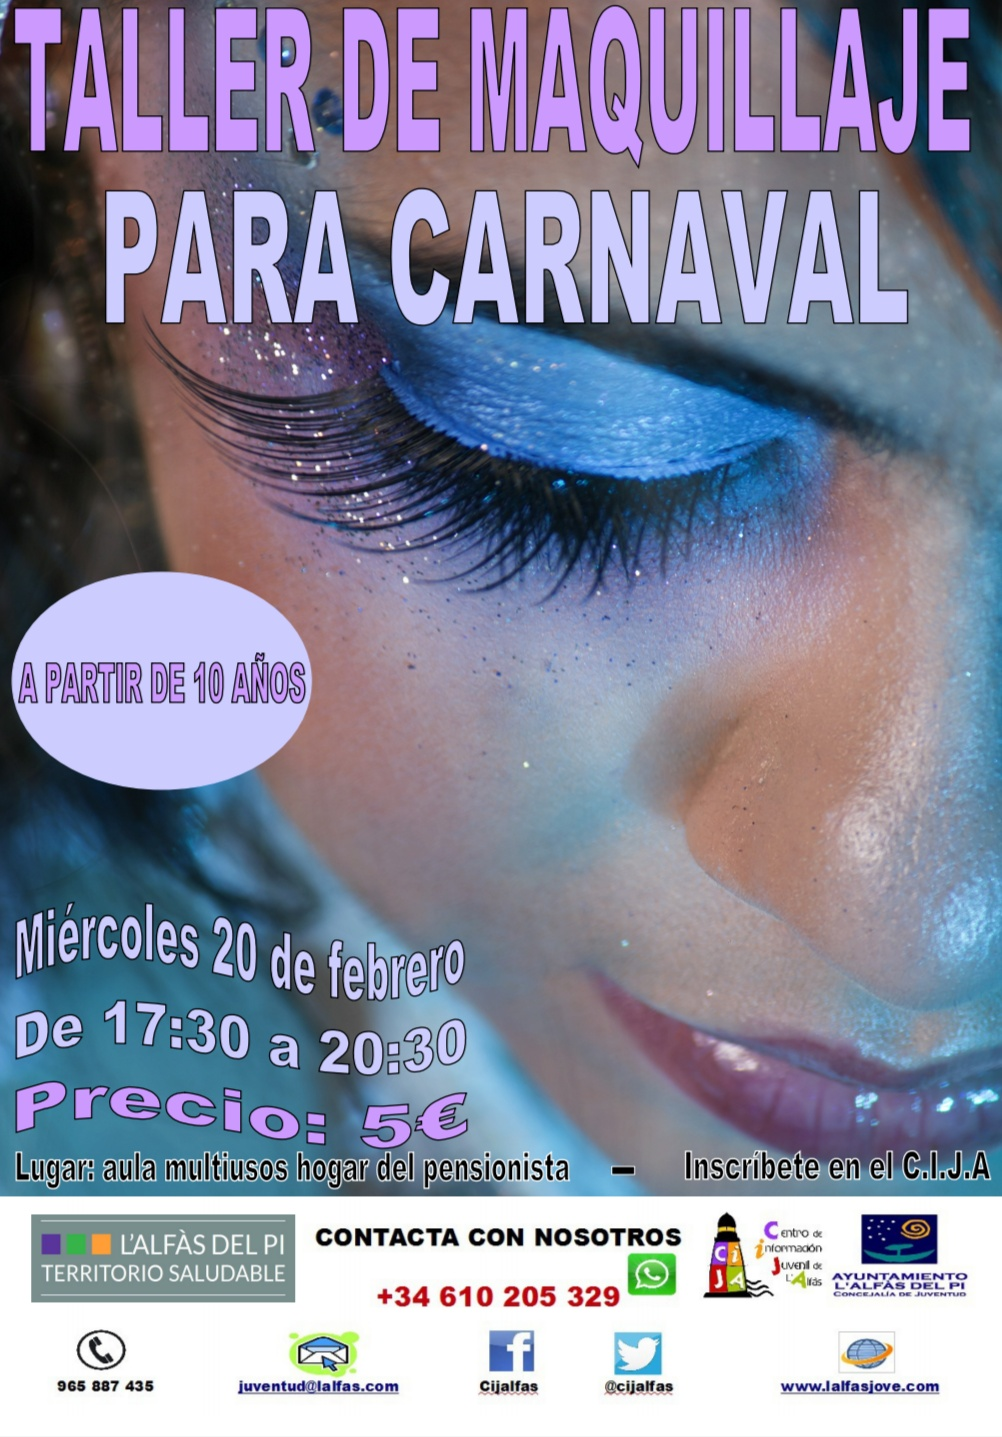 Juventud lanza un taller de maquillaje para Carnaval